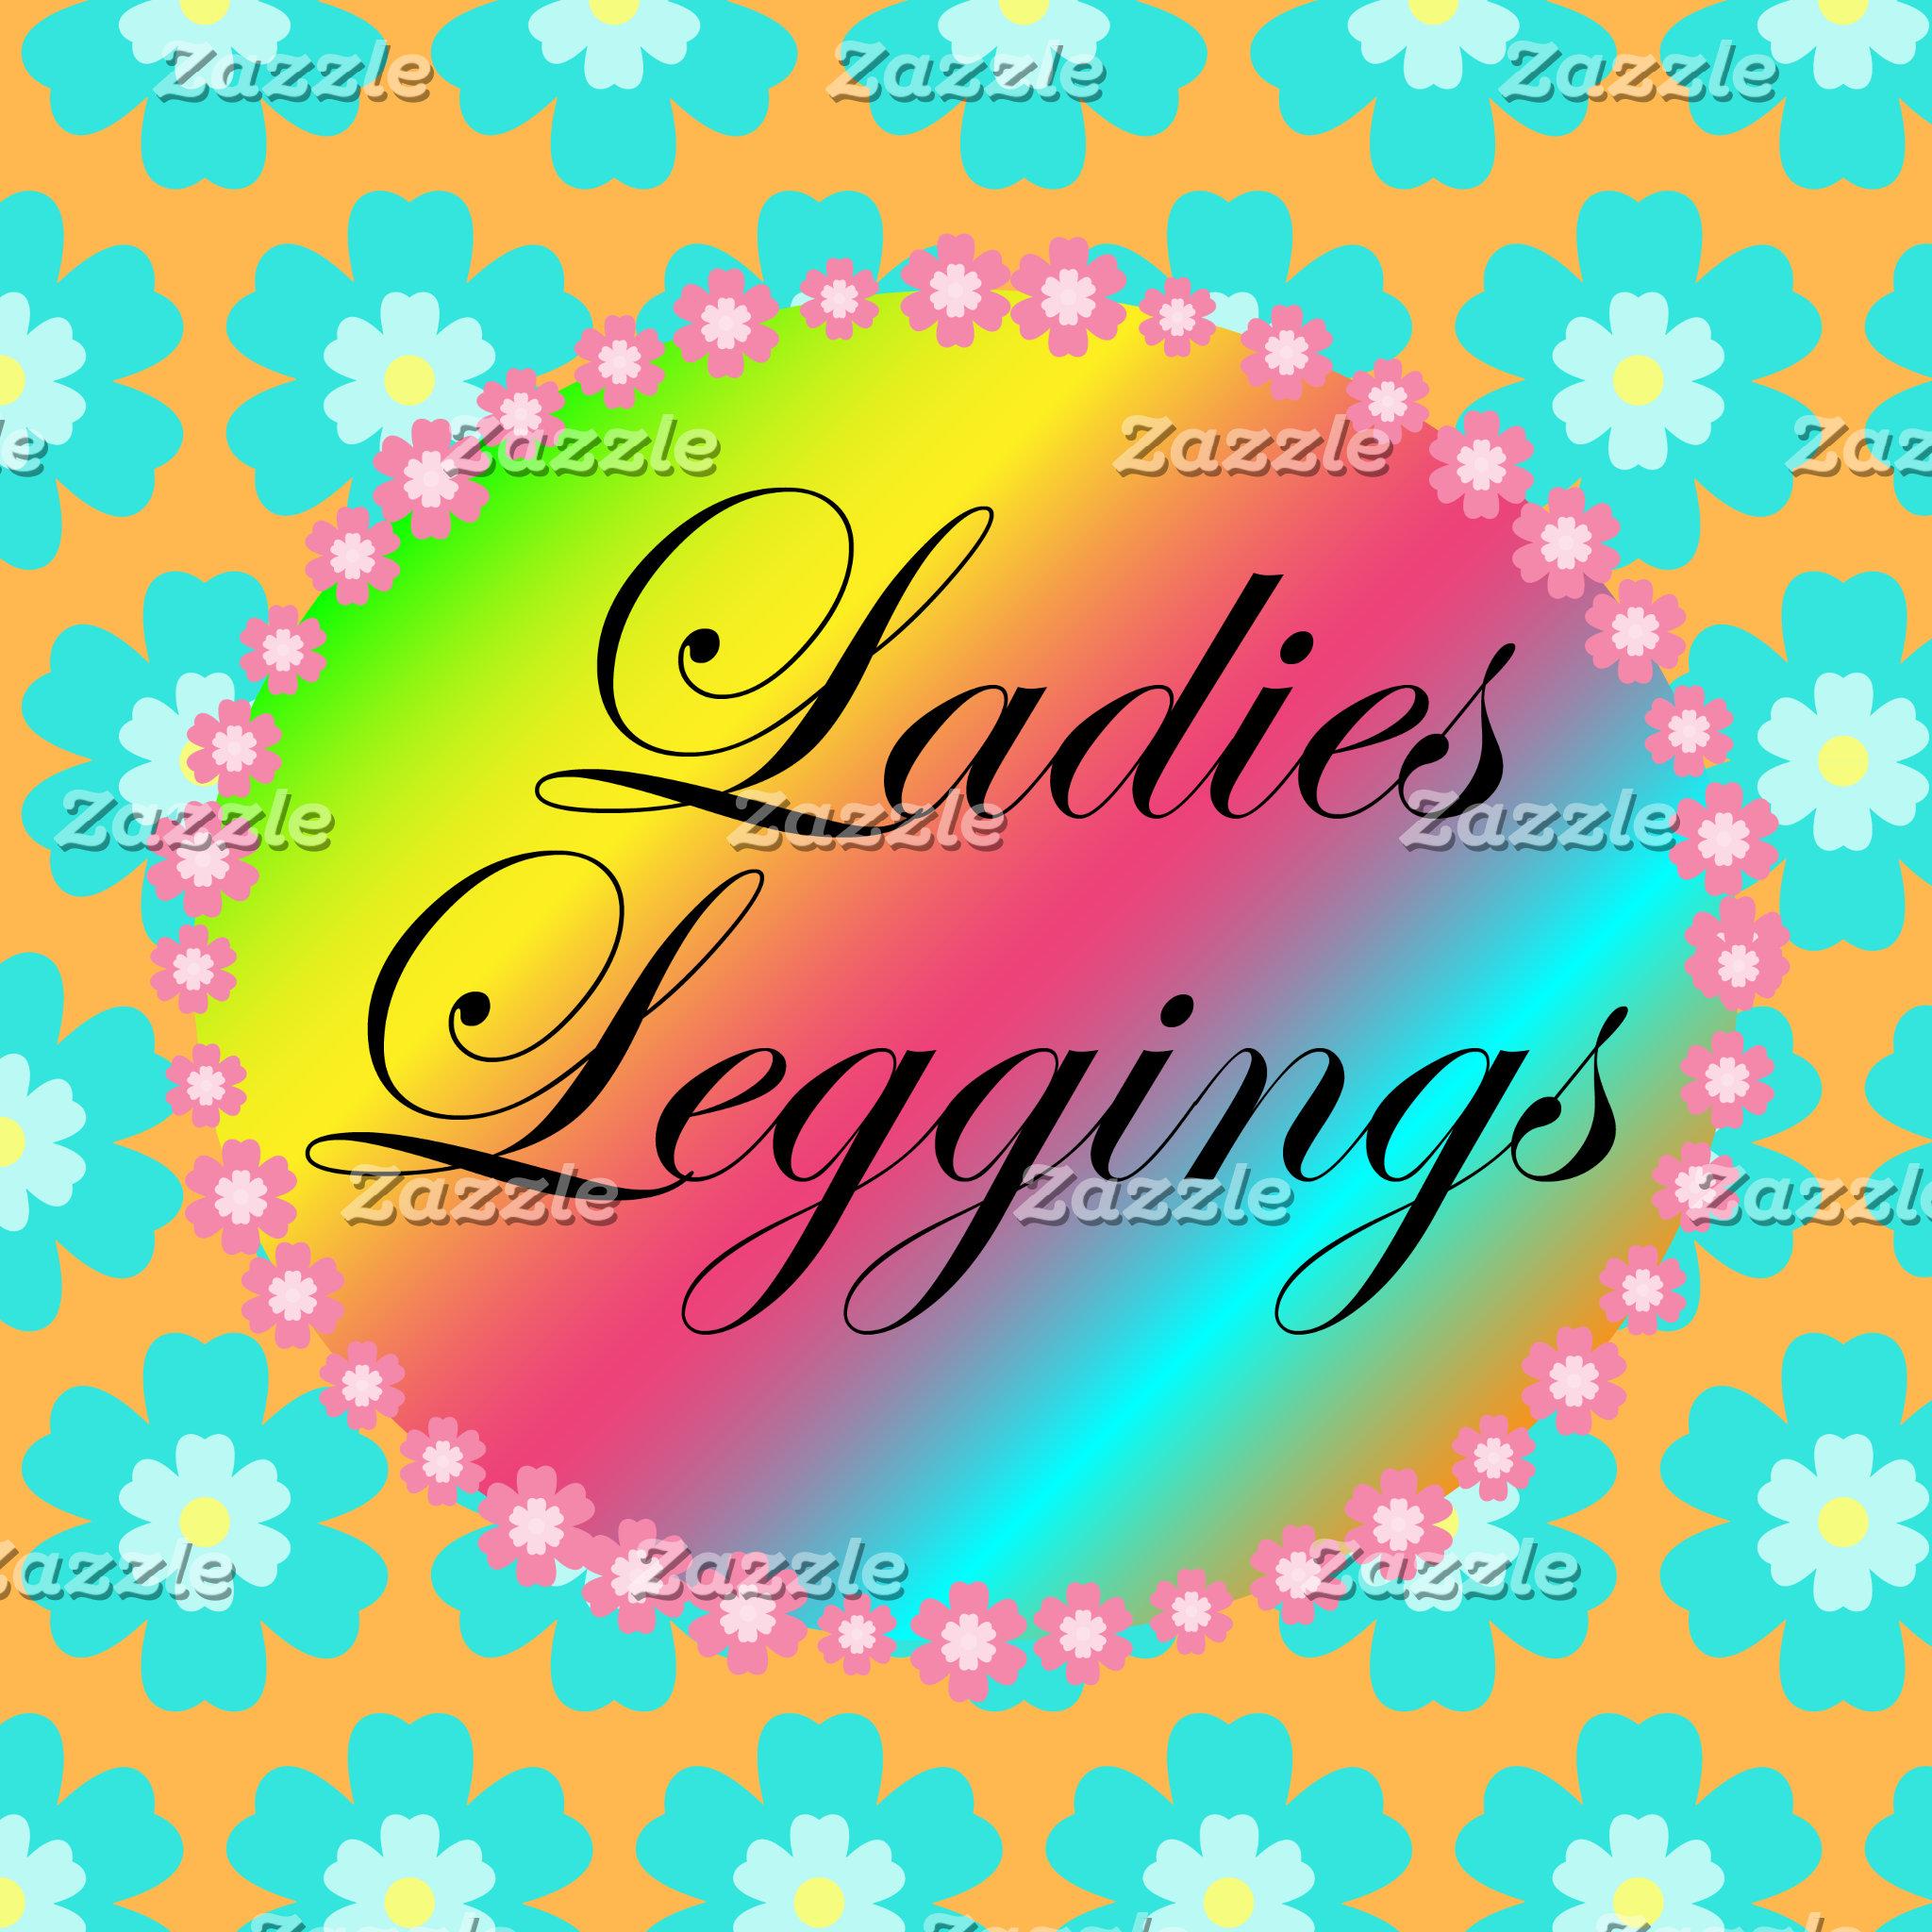 07. Ladies Leggings